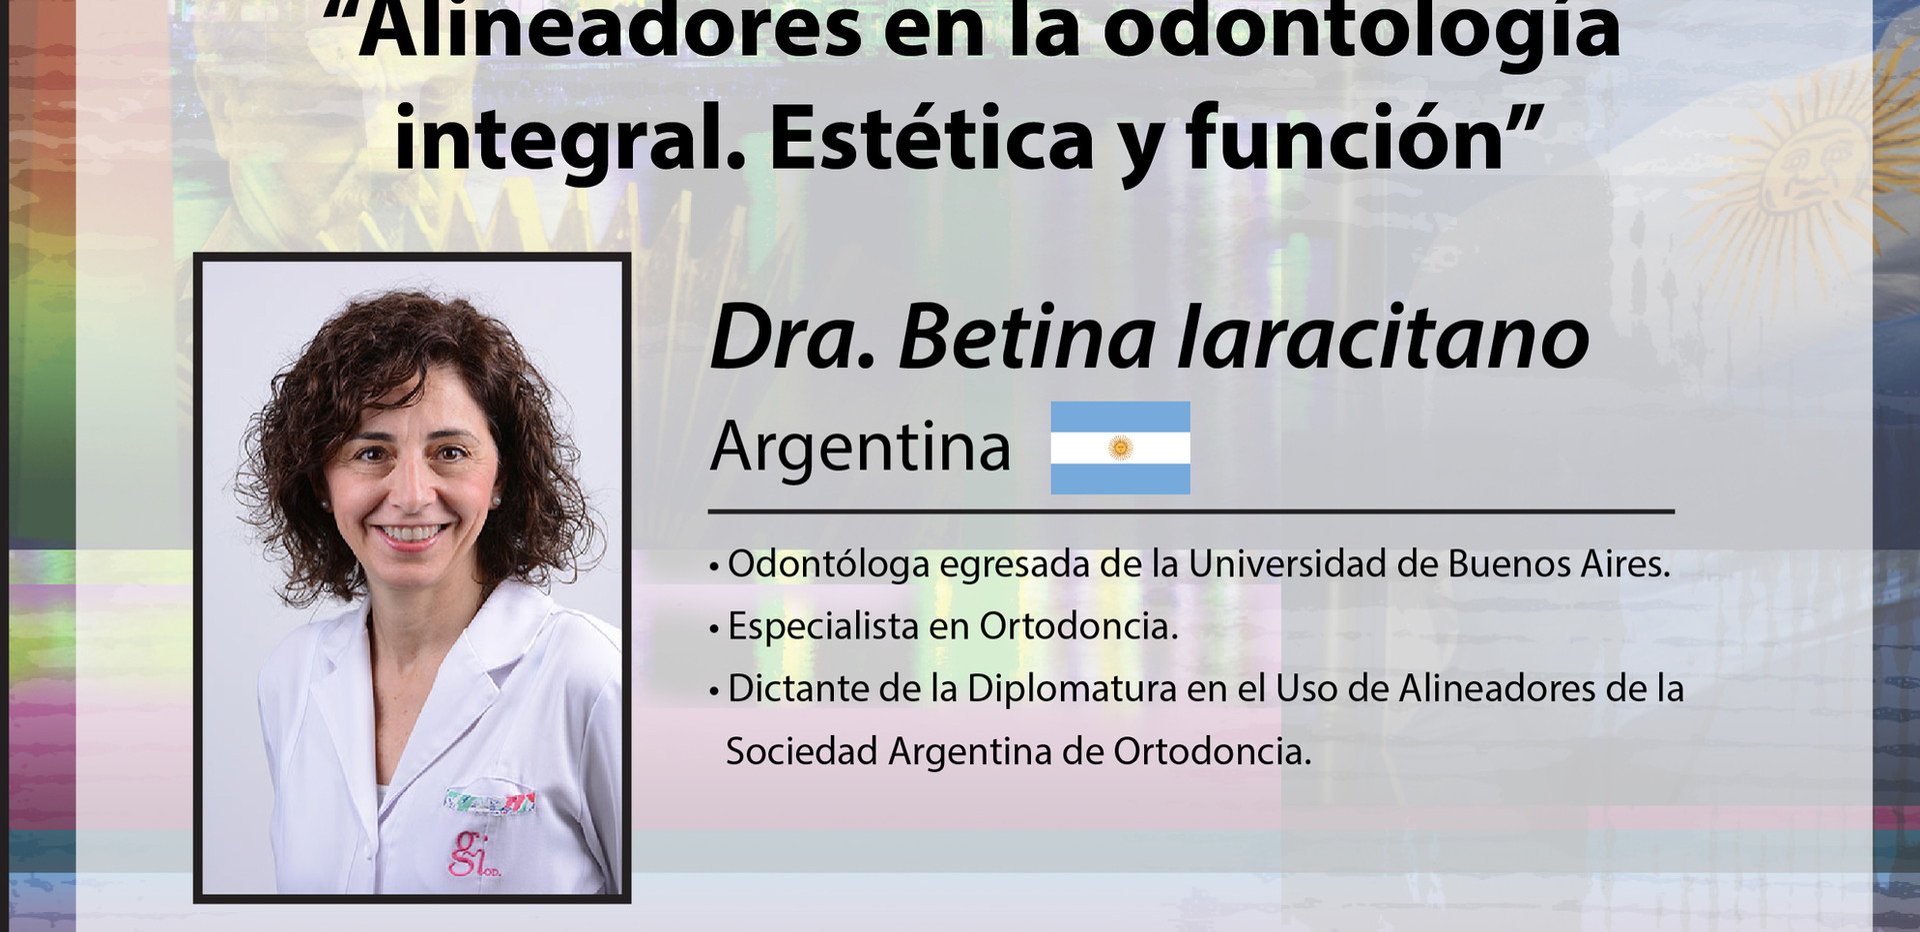 Dra. Betina Iaracitano